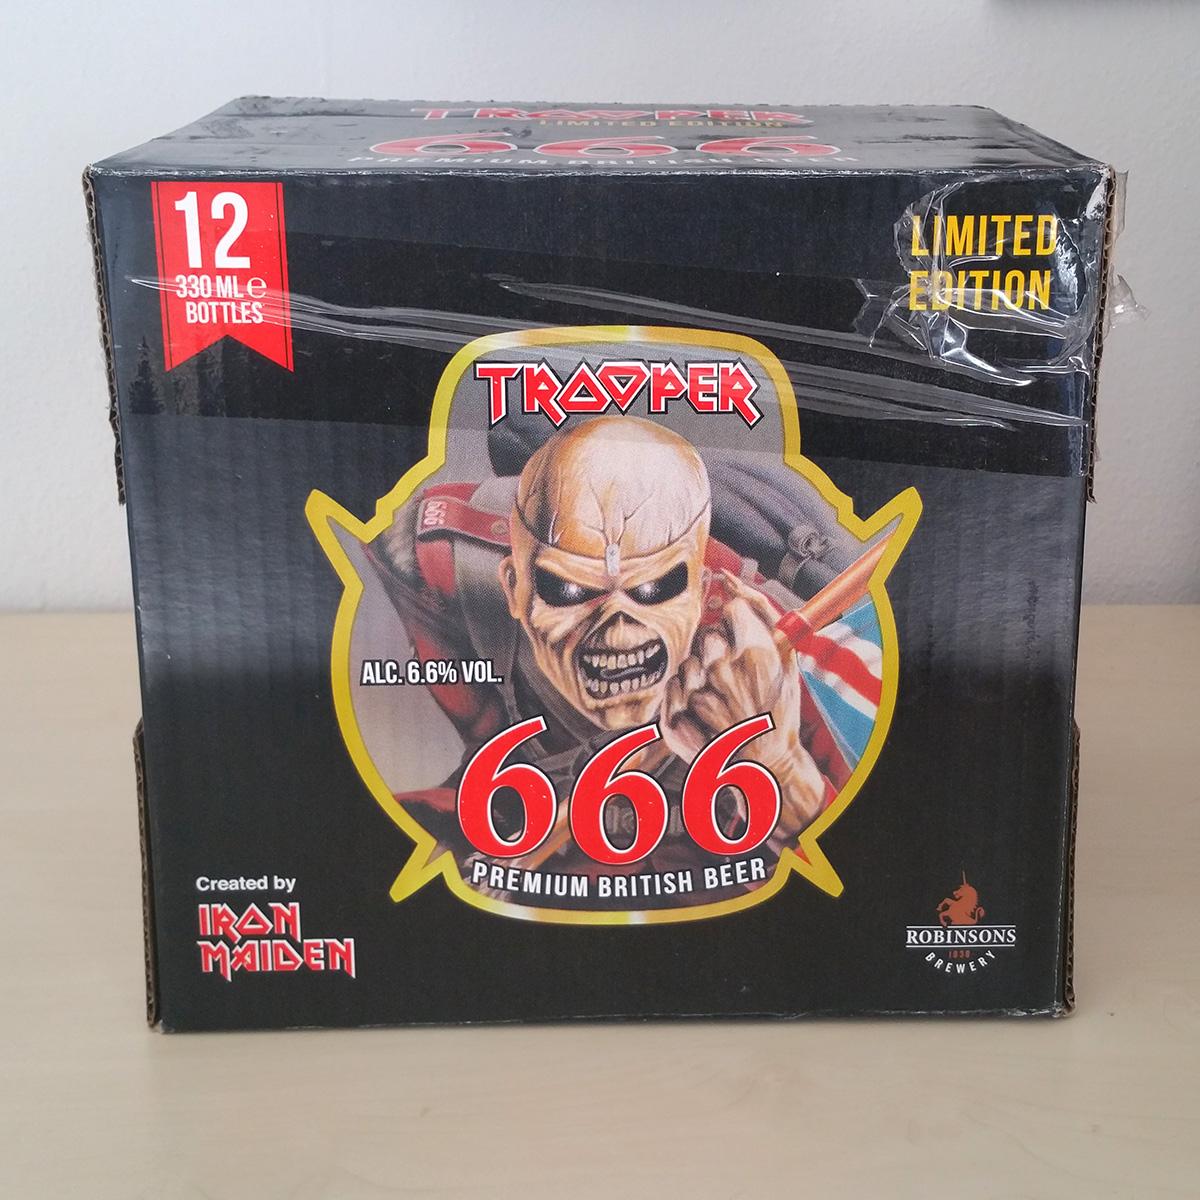 7ada5e88a Iron Maiden - The Trooper 666 Beer 12 Bottles Box - Iron Maiden ...